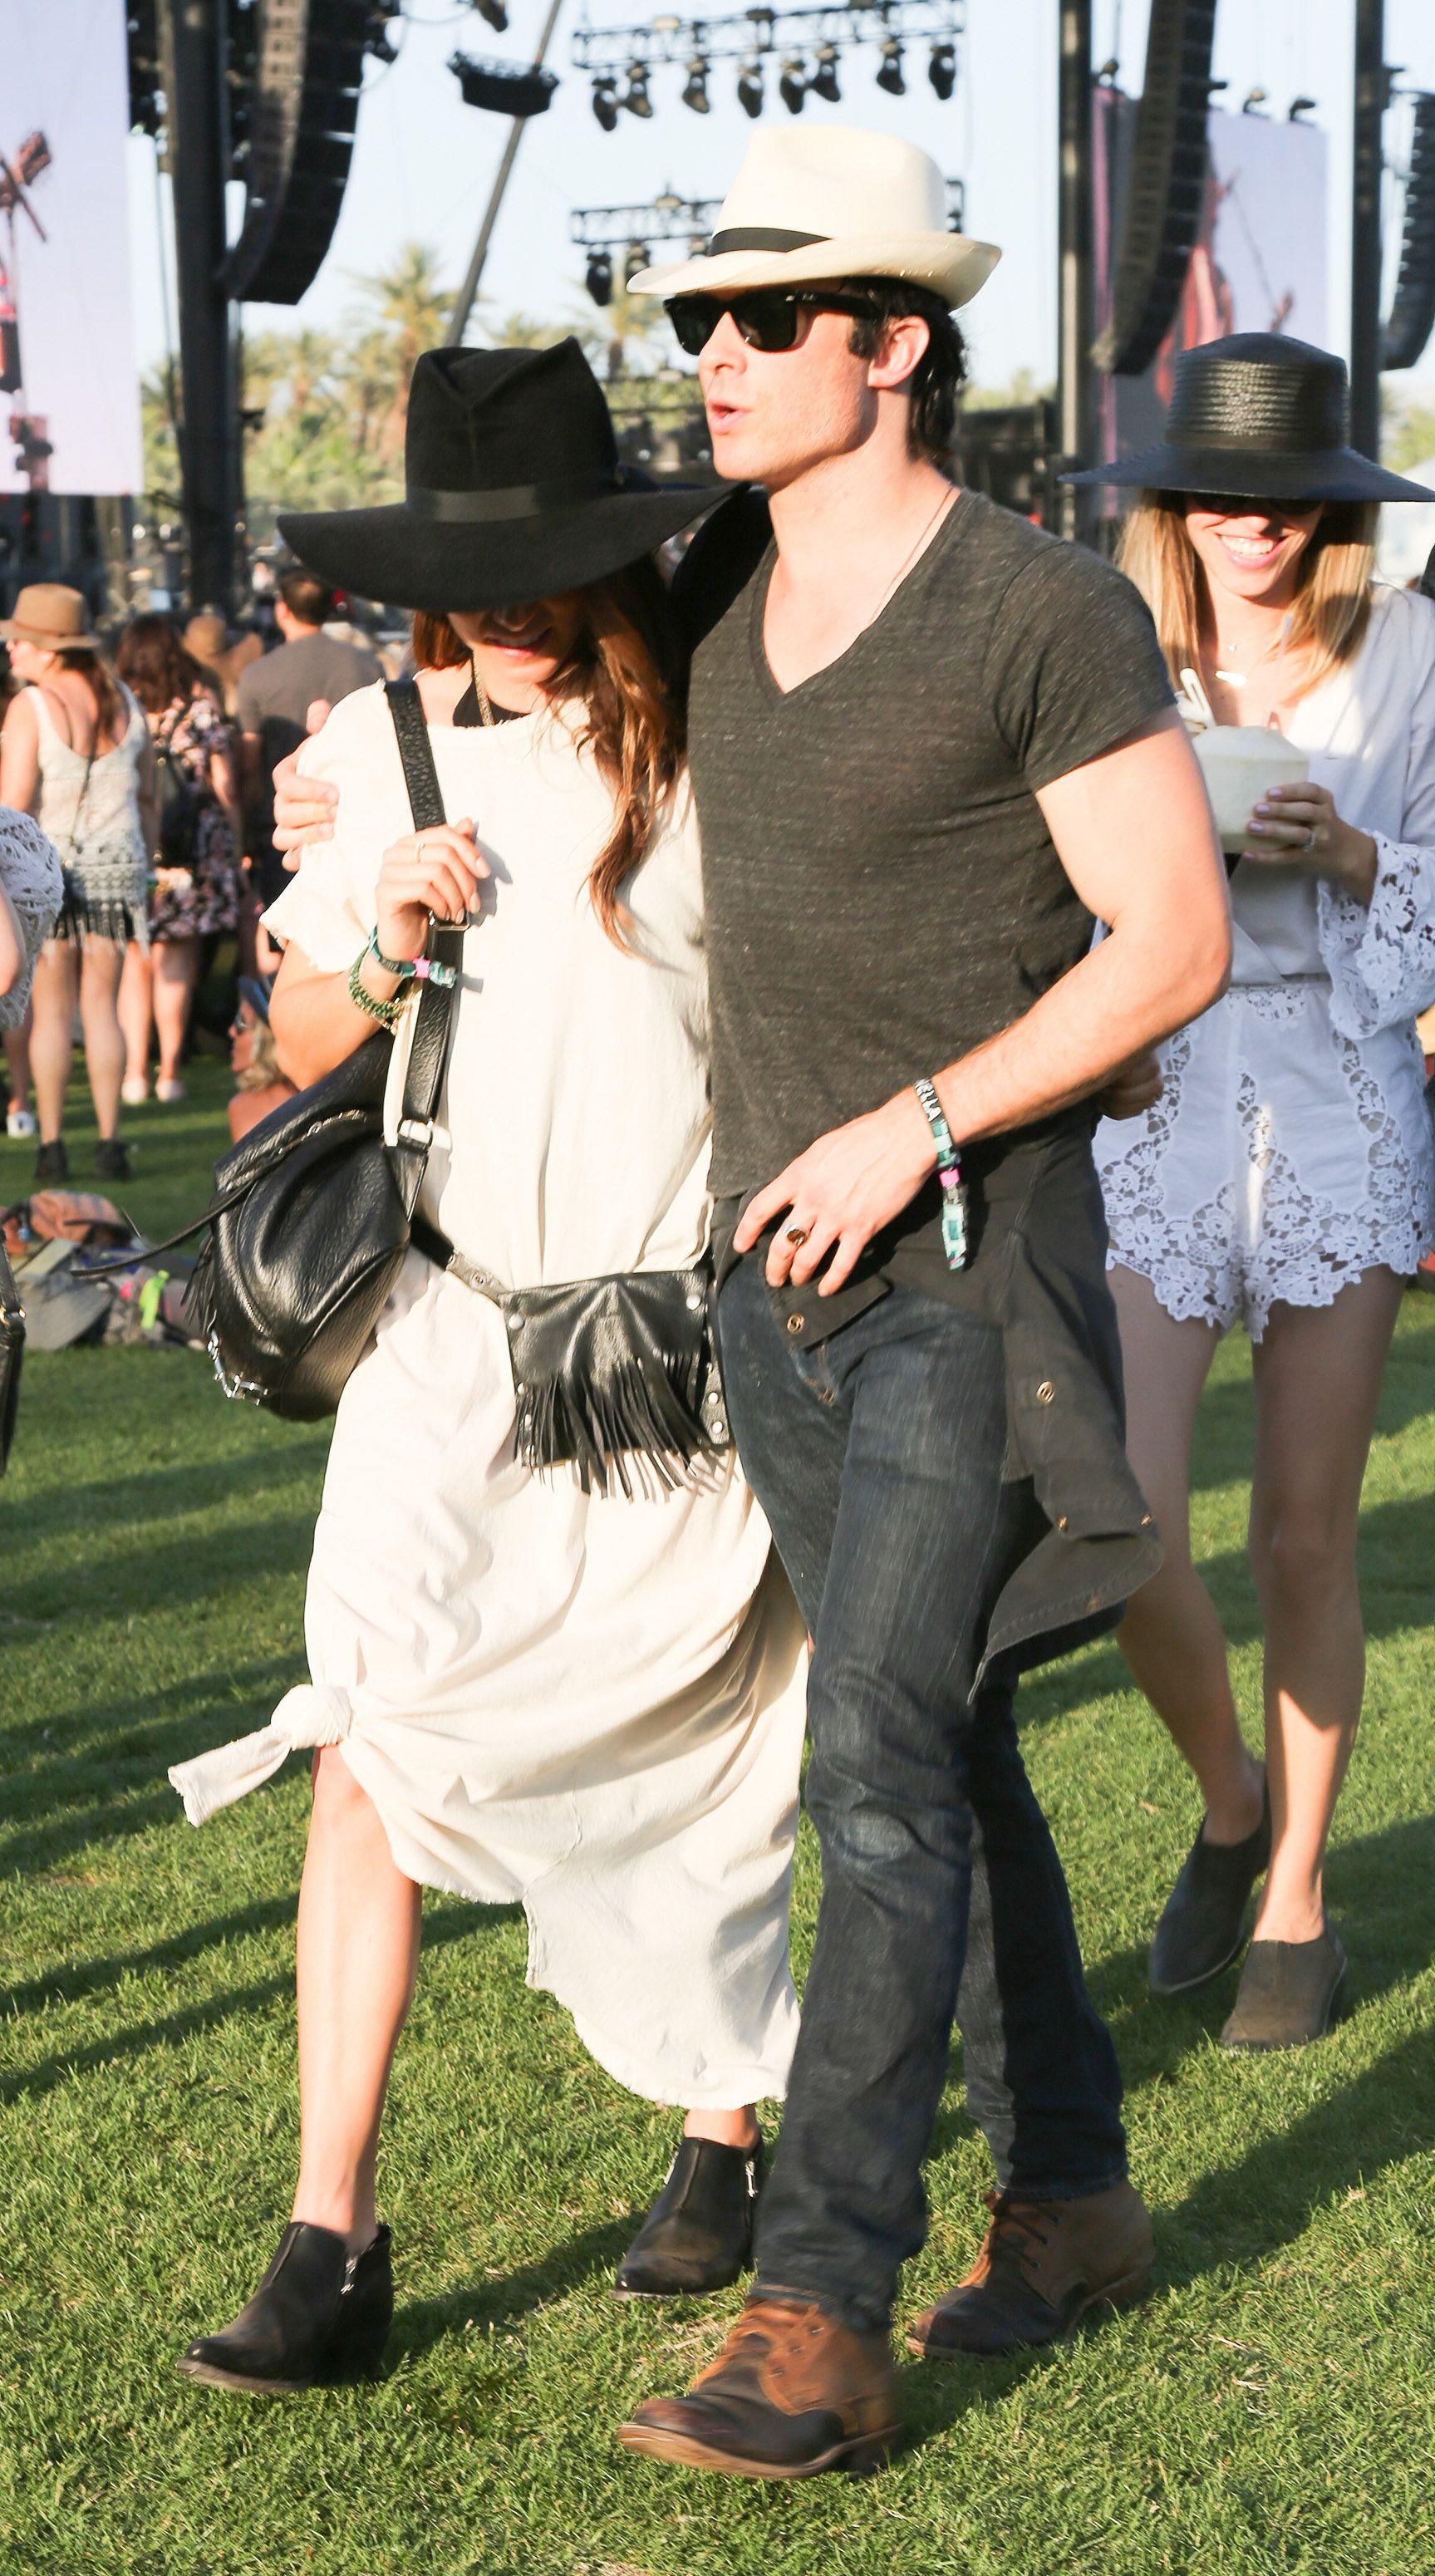 Ian Somerhalder and Nikki Reed Can't Stop Kissing at Coachella